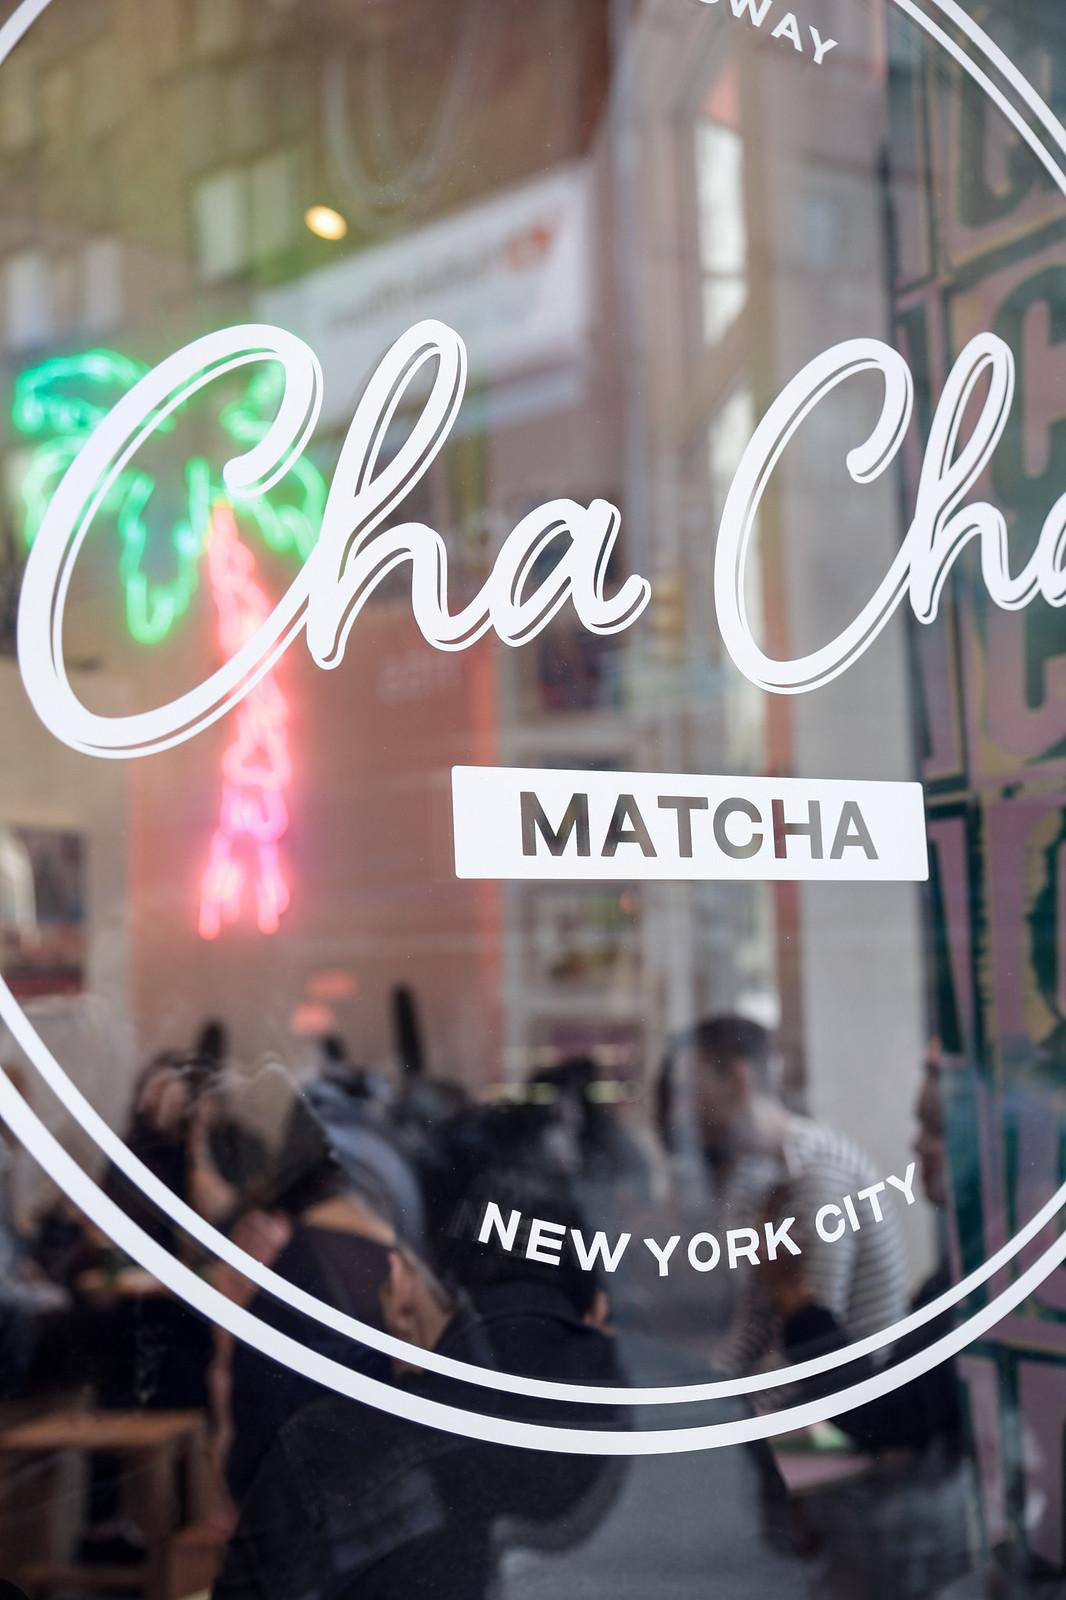 013_cha_cha_matcha_cafeteria_rosa_nueva_york_el_mejor_matcha_unicorn_croissant_breakfast_theguestgirl_nyc